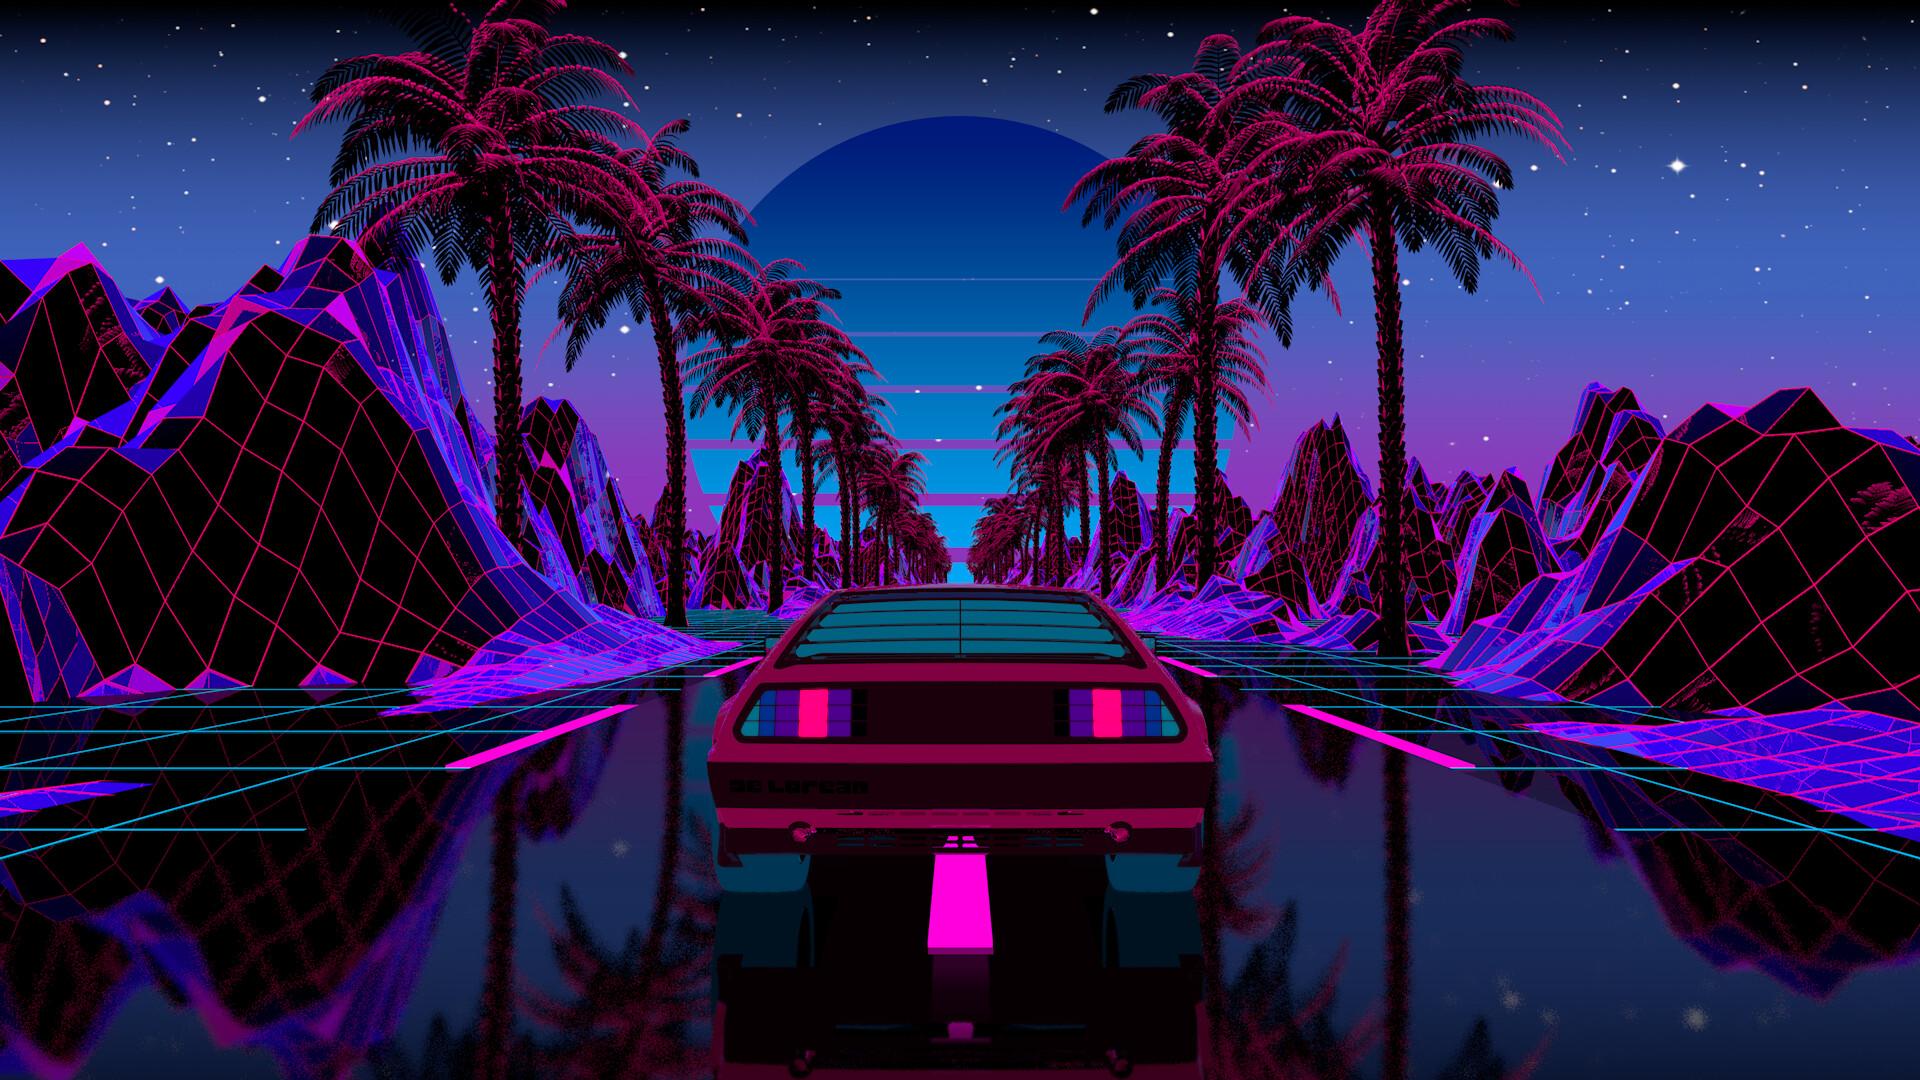 General 1920x1080 OutRun car vehicle transport palm trees cyber reflection Sun purple pink cyan digital artwork illustration evening neon landscape nature mountains vaporwave synthwave Retrowave